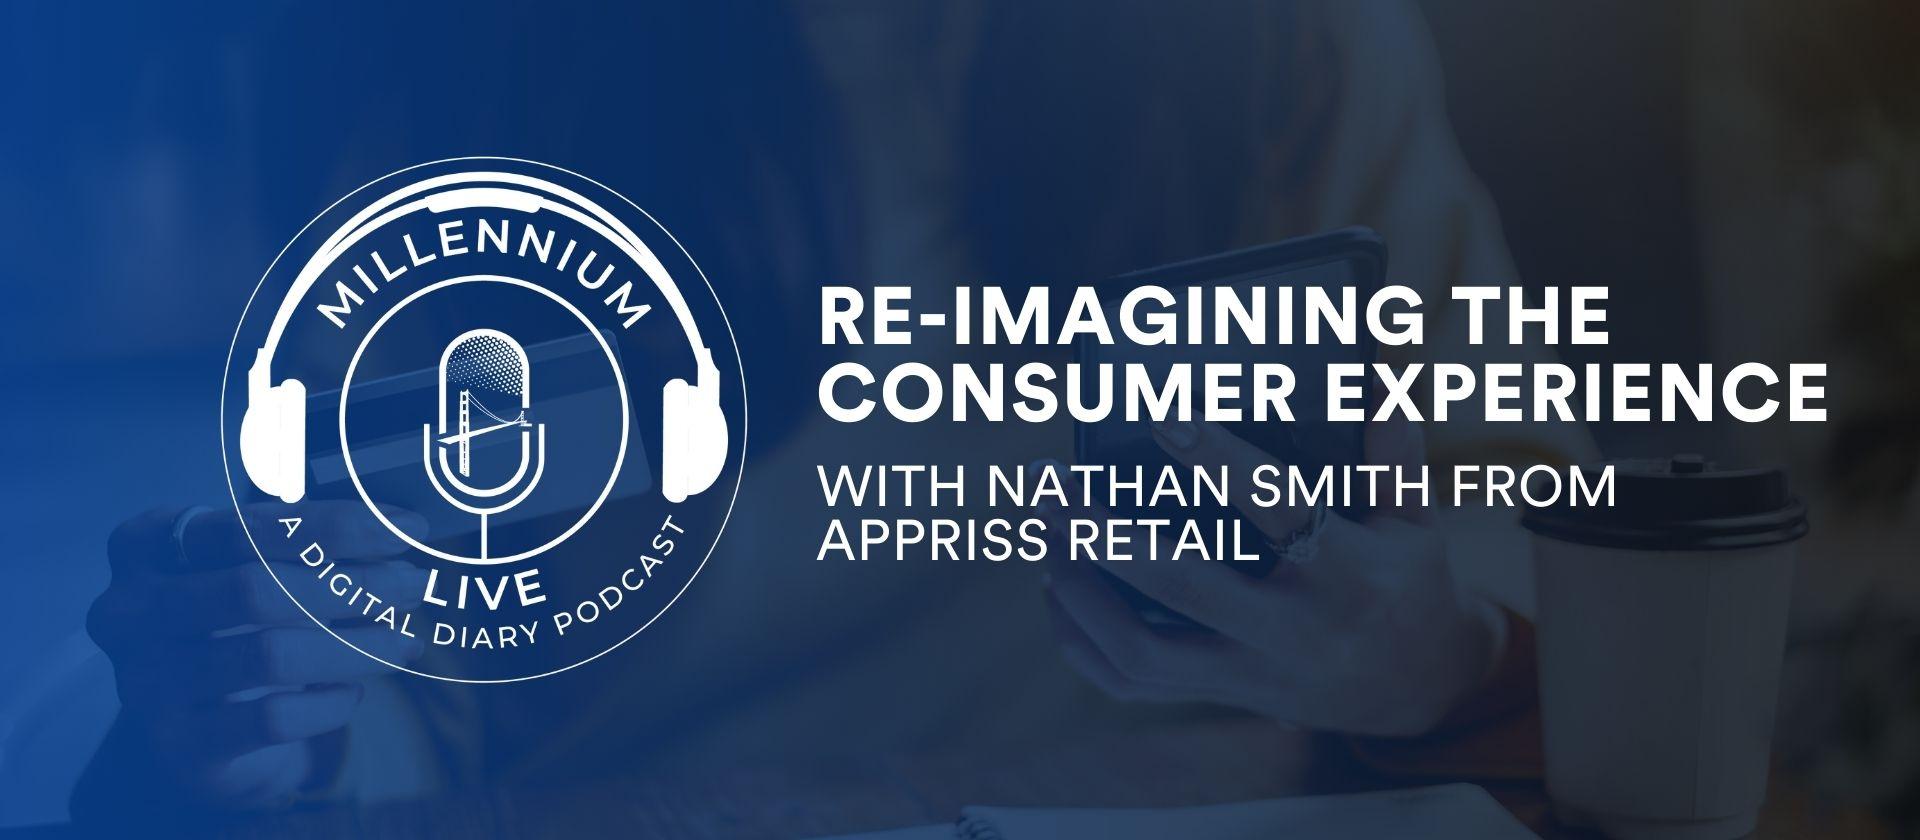 appriss-retail-returns